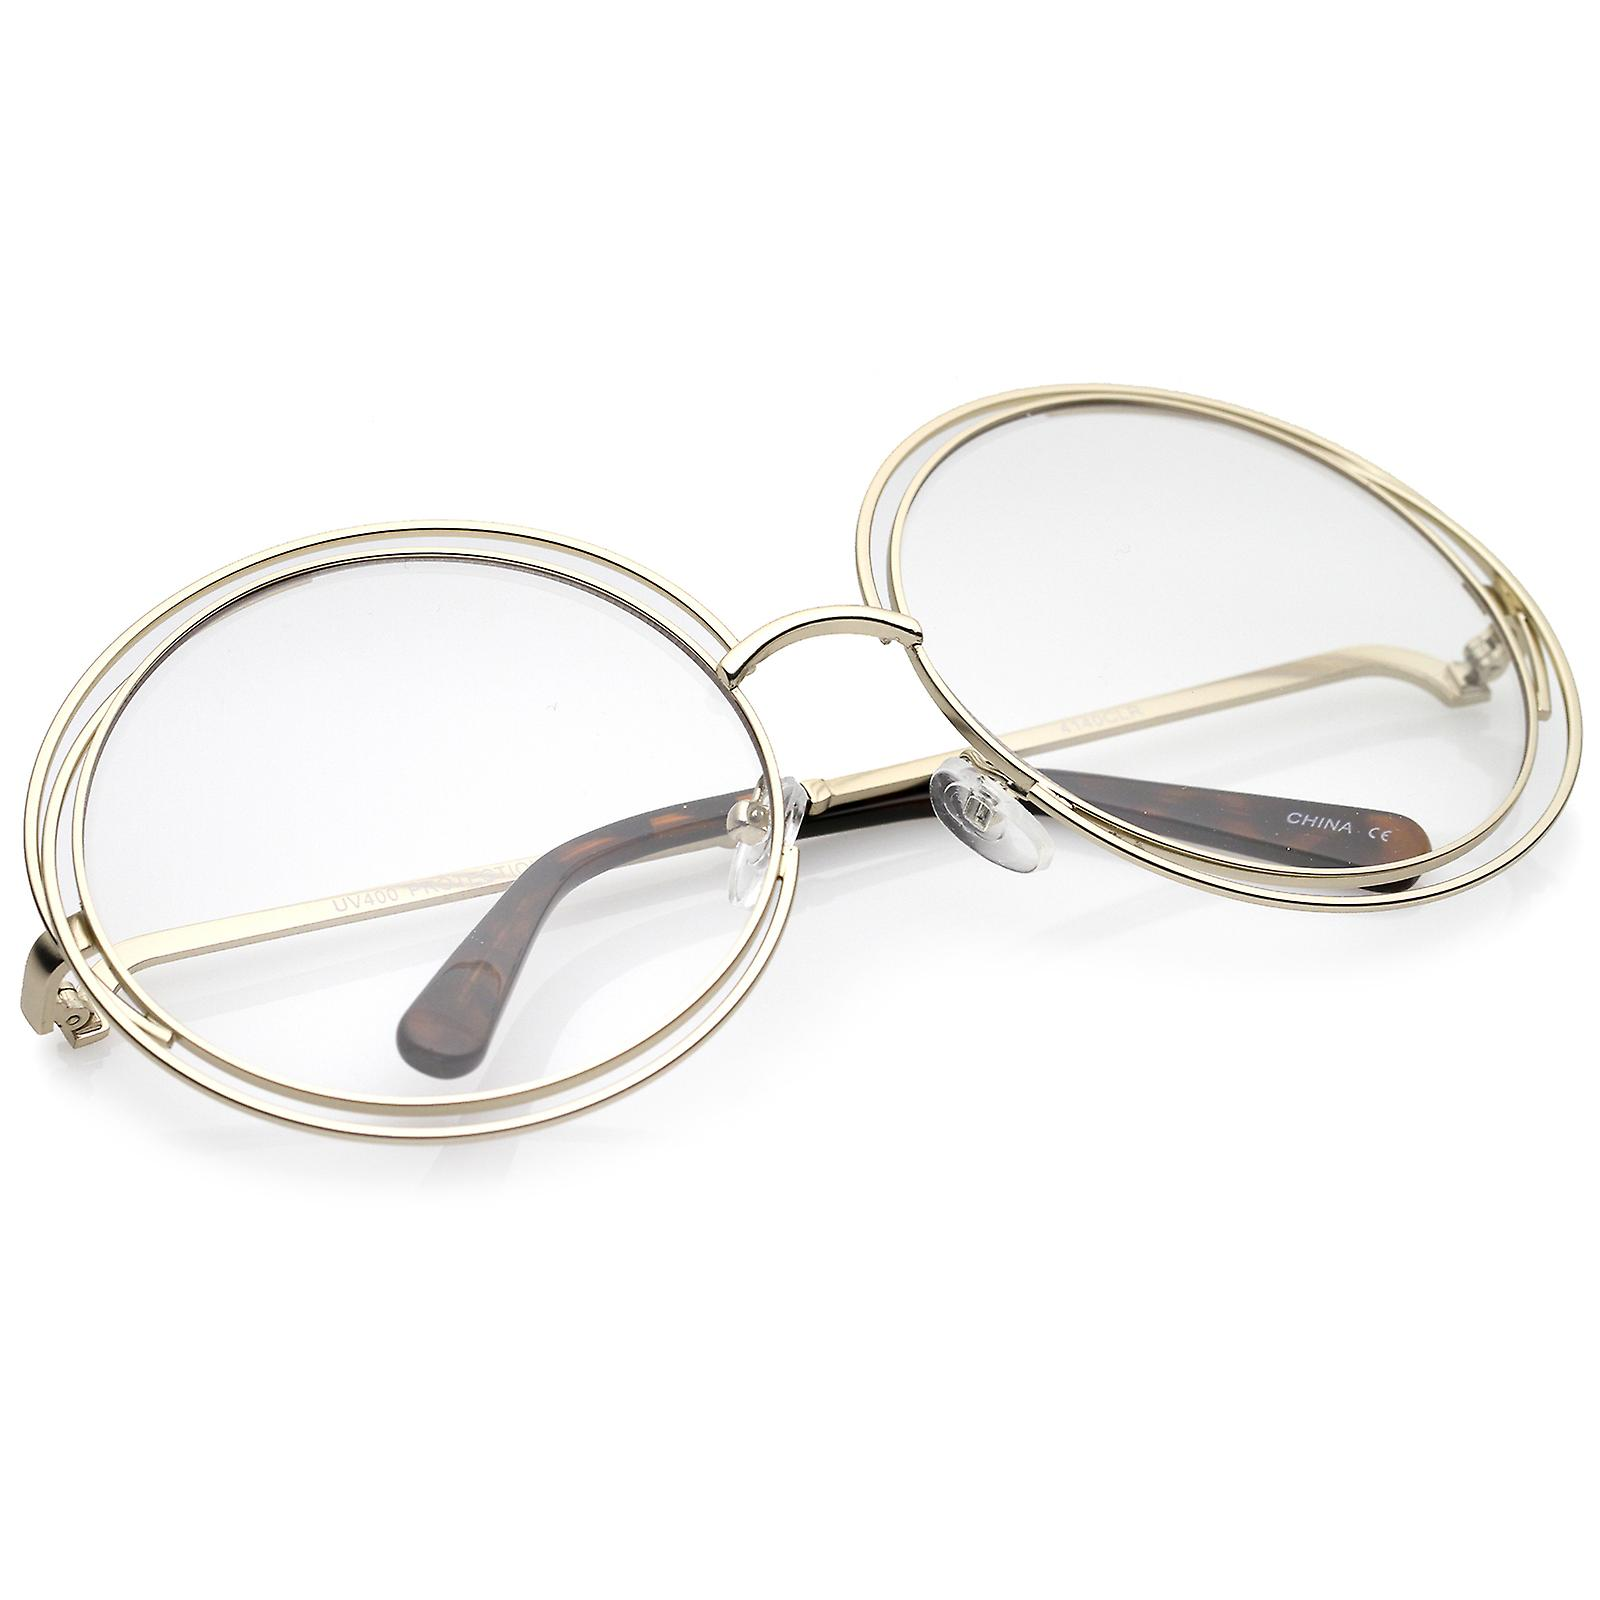 00e4b62d60 Women s Oversize Wire Frame Clear Lens Round Eyeglasses 62mm